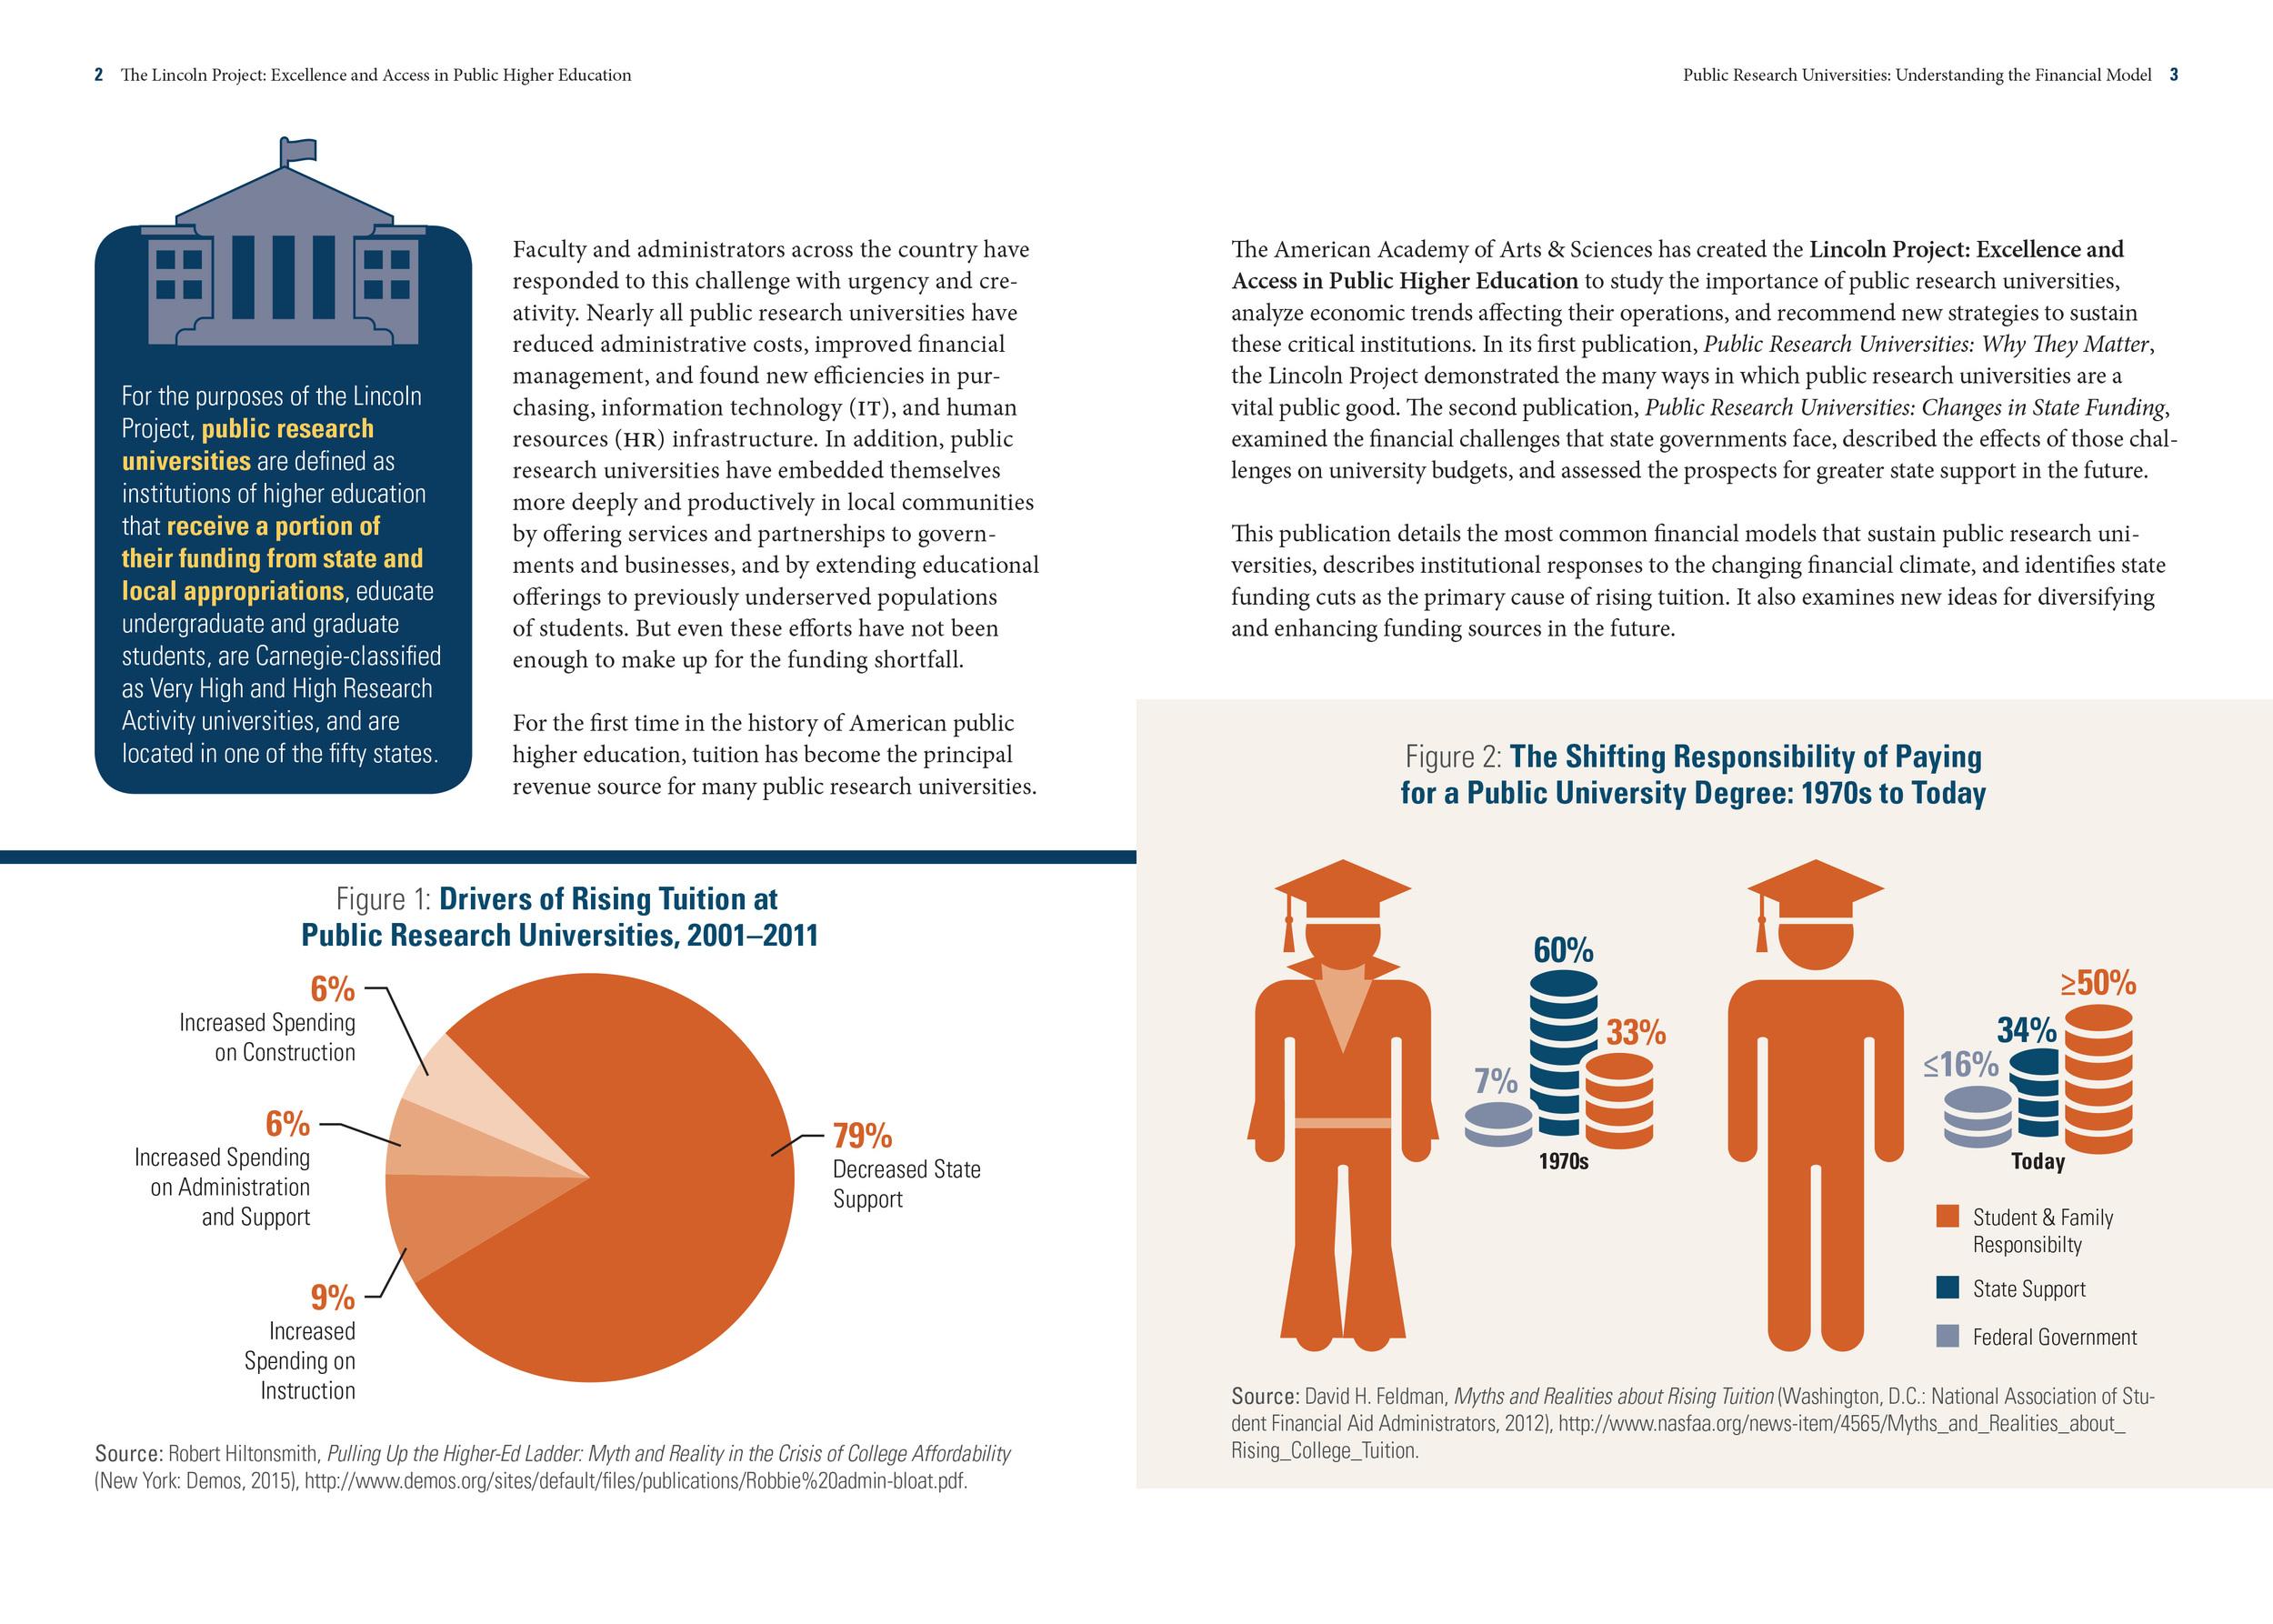 Public Research Universities: Understanding the Financial Model